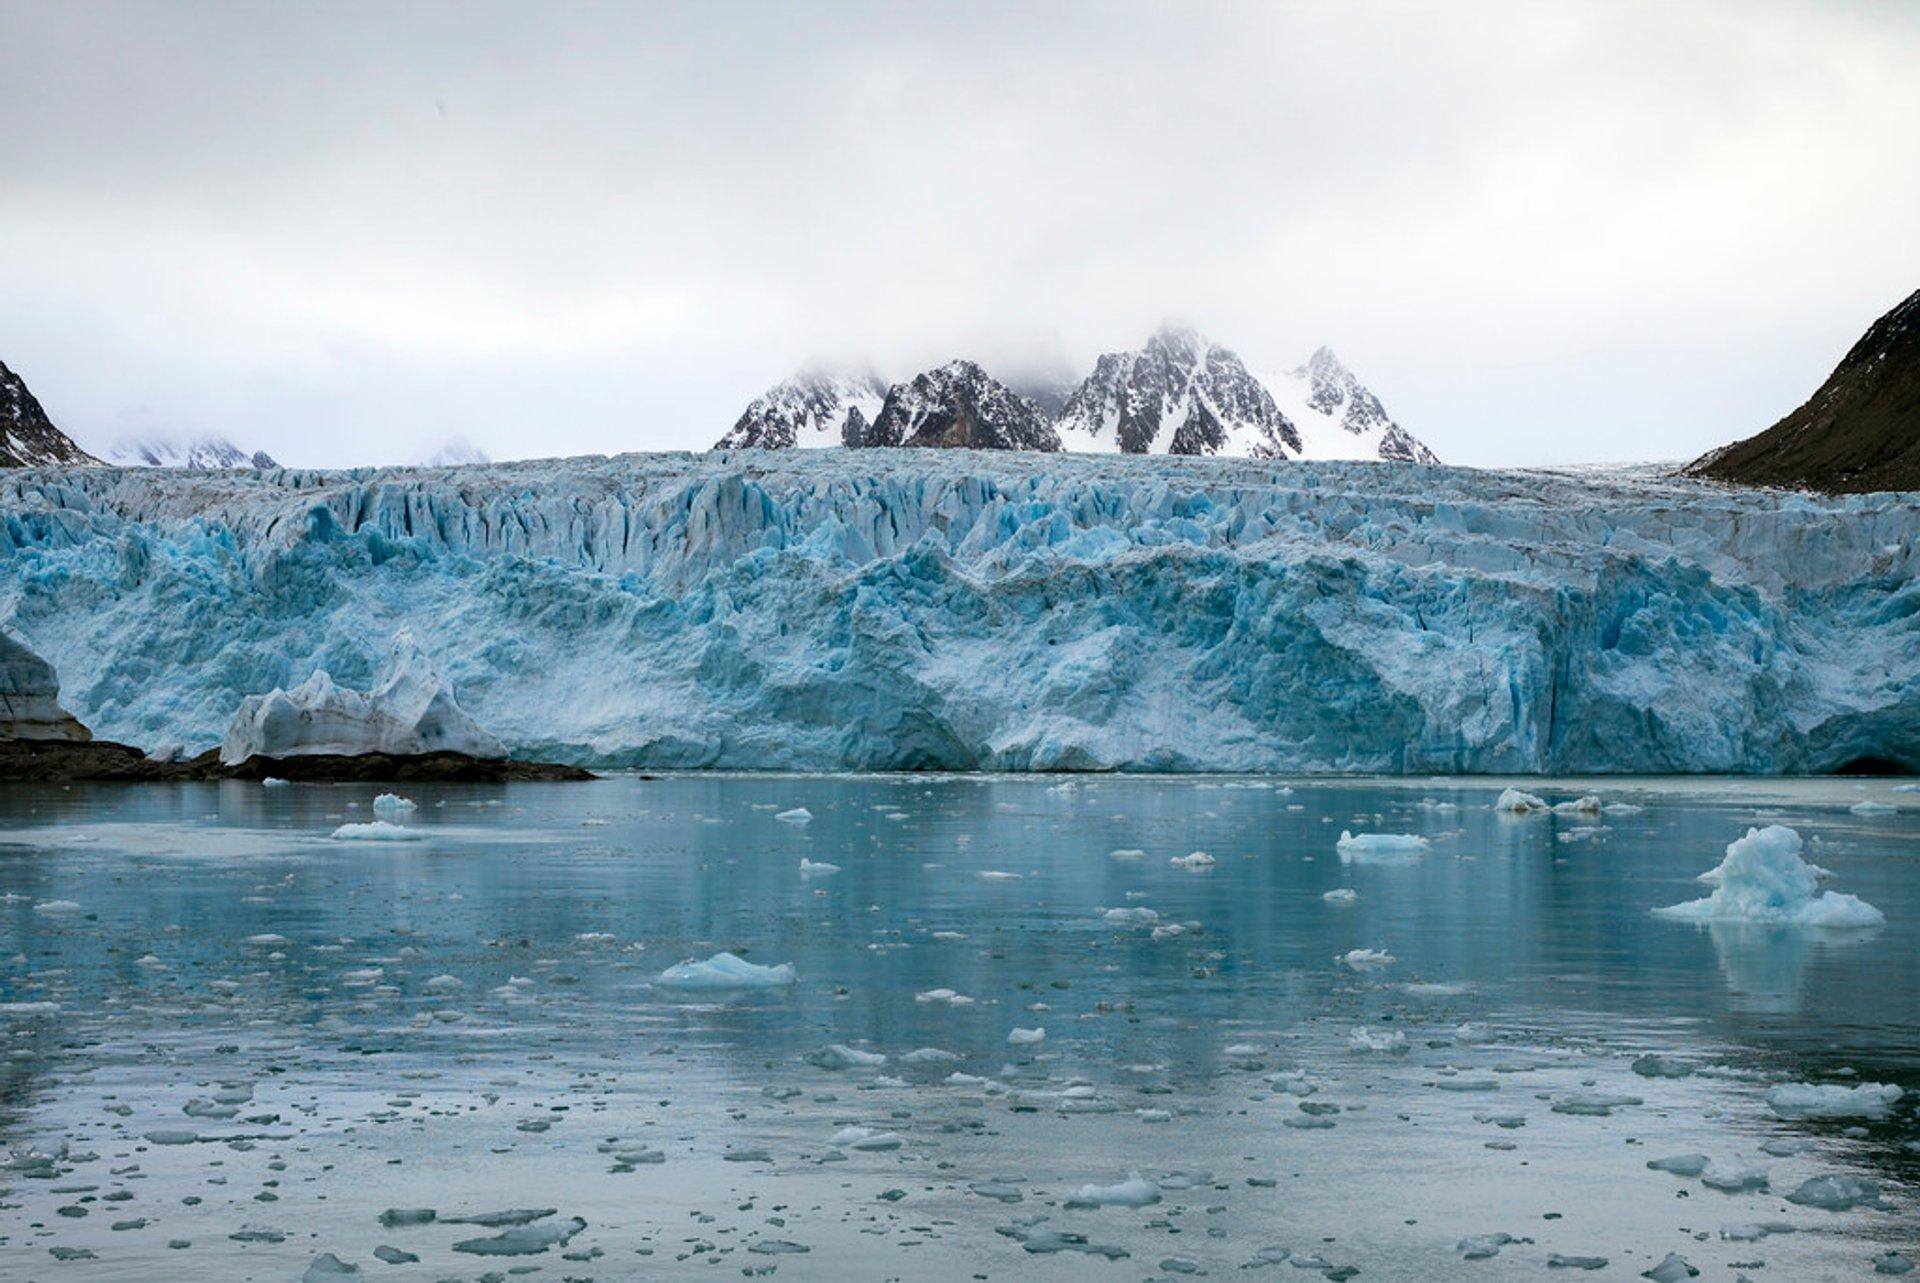 Nordenskiöldbreen Glacier 2020